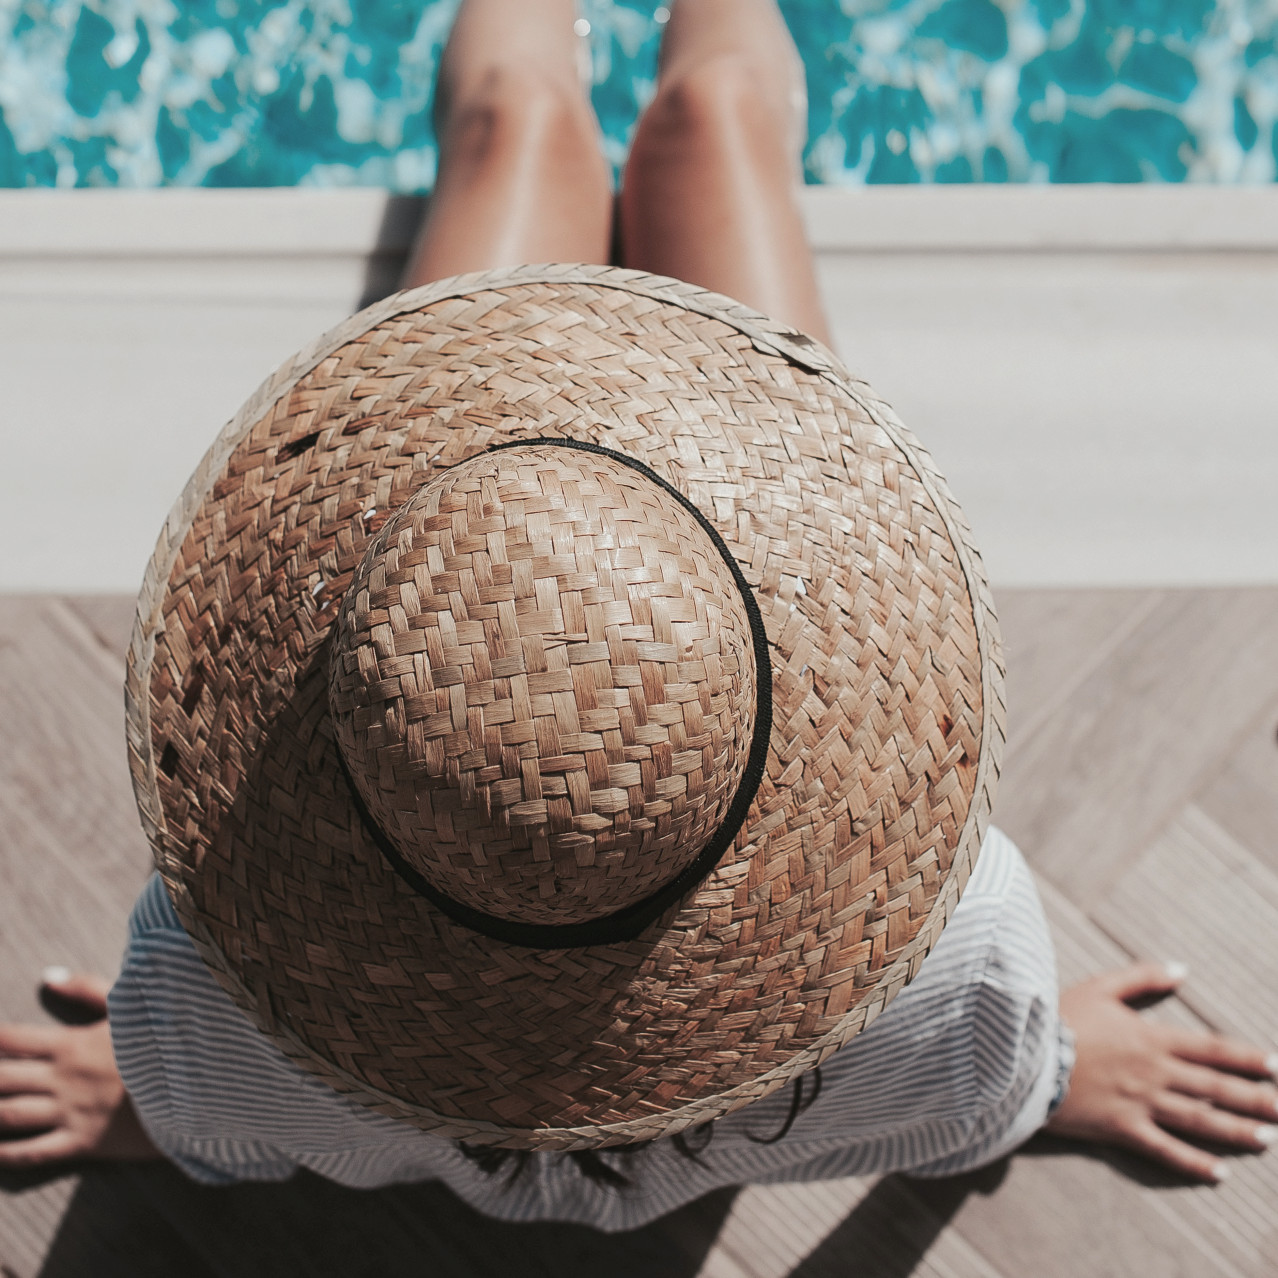 Eco-friendly summer essentials